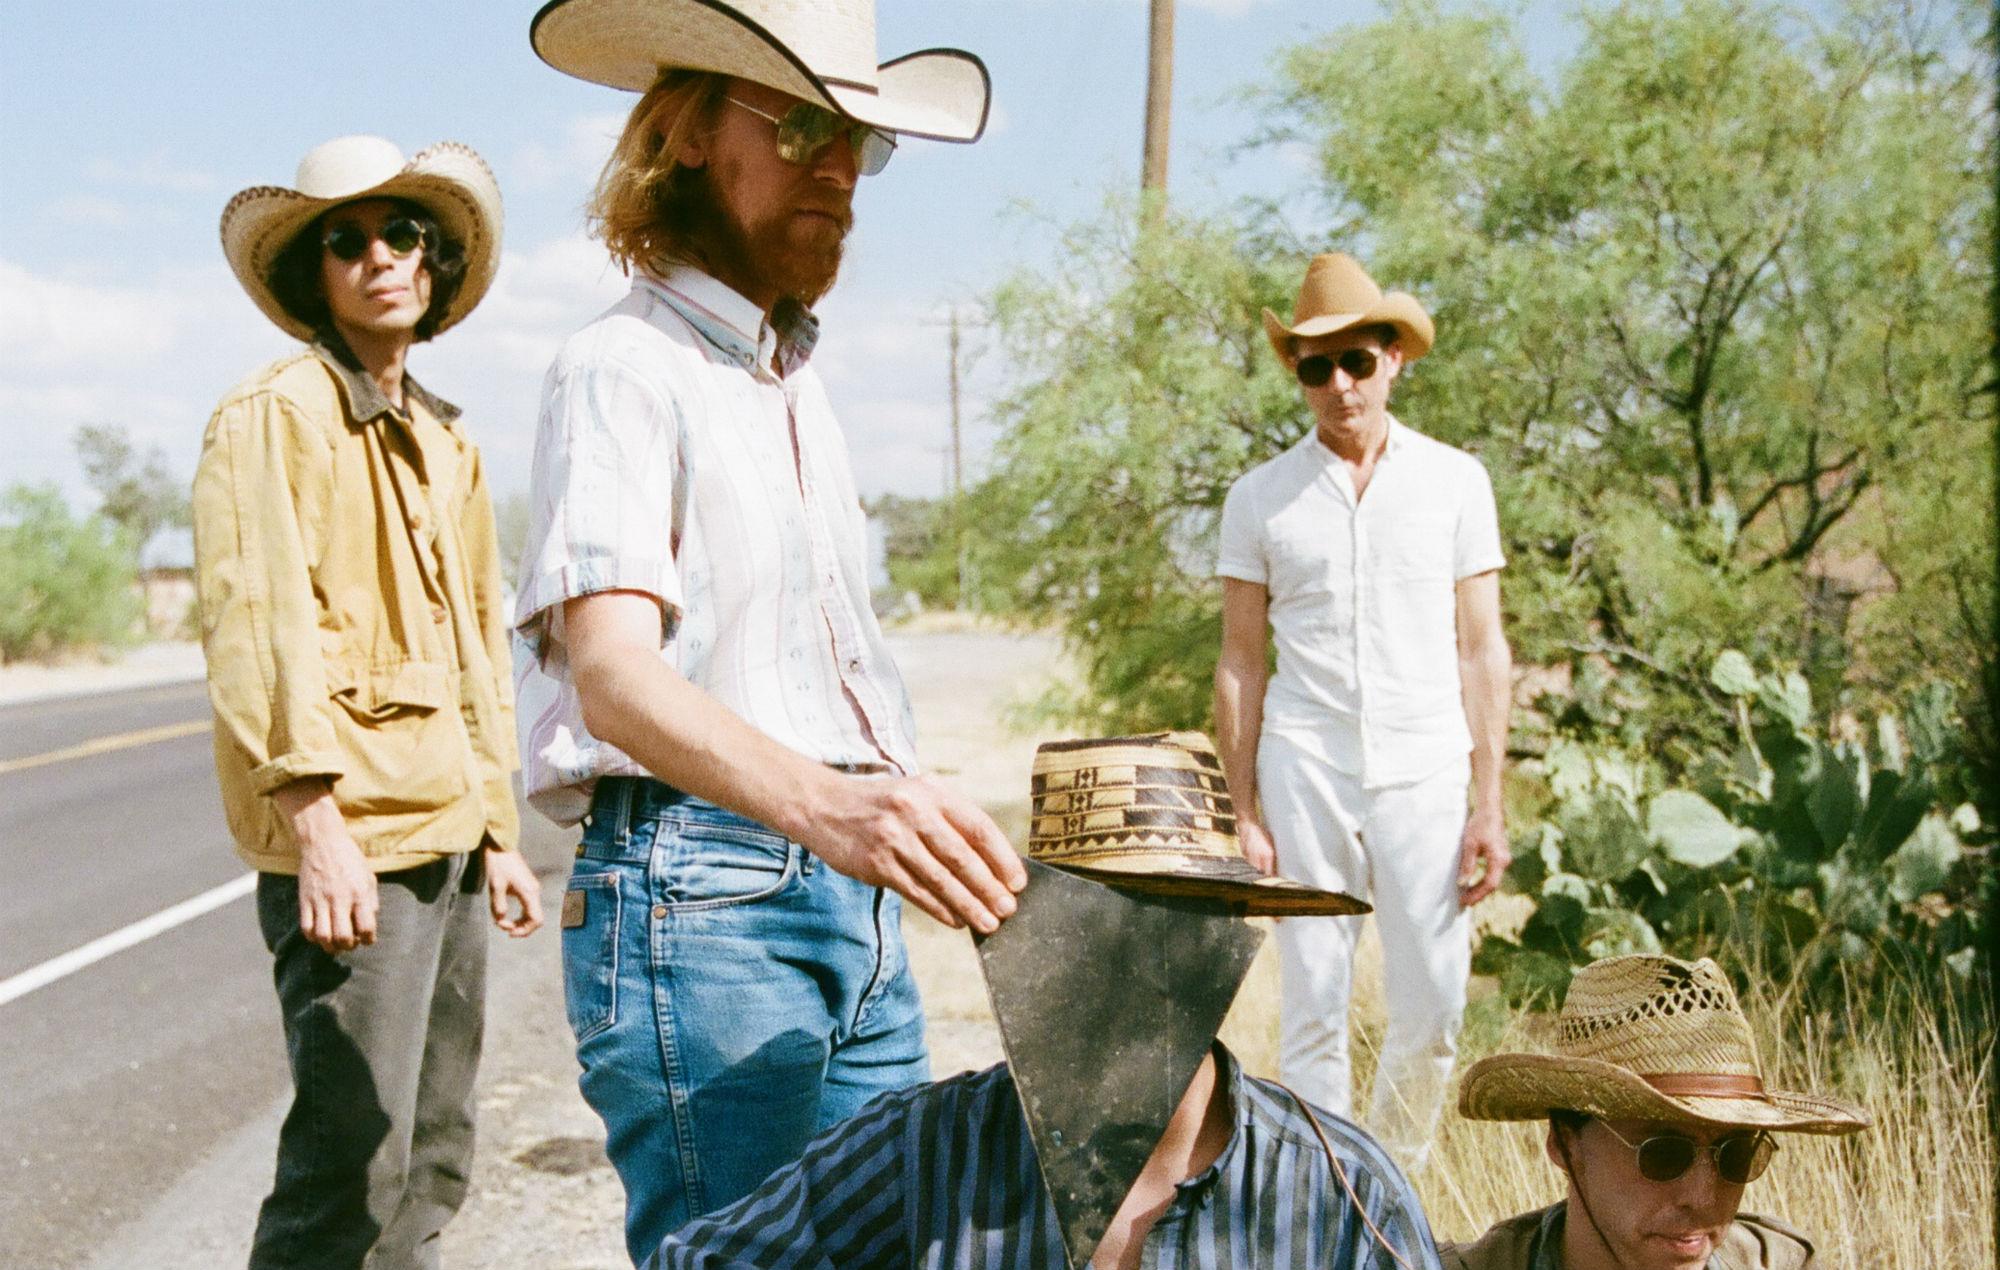 Band members Moses Archuleta, Javier Morales, Bradford Cox, Josh McKay, and Lockett Pundt.